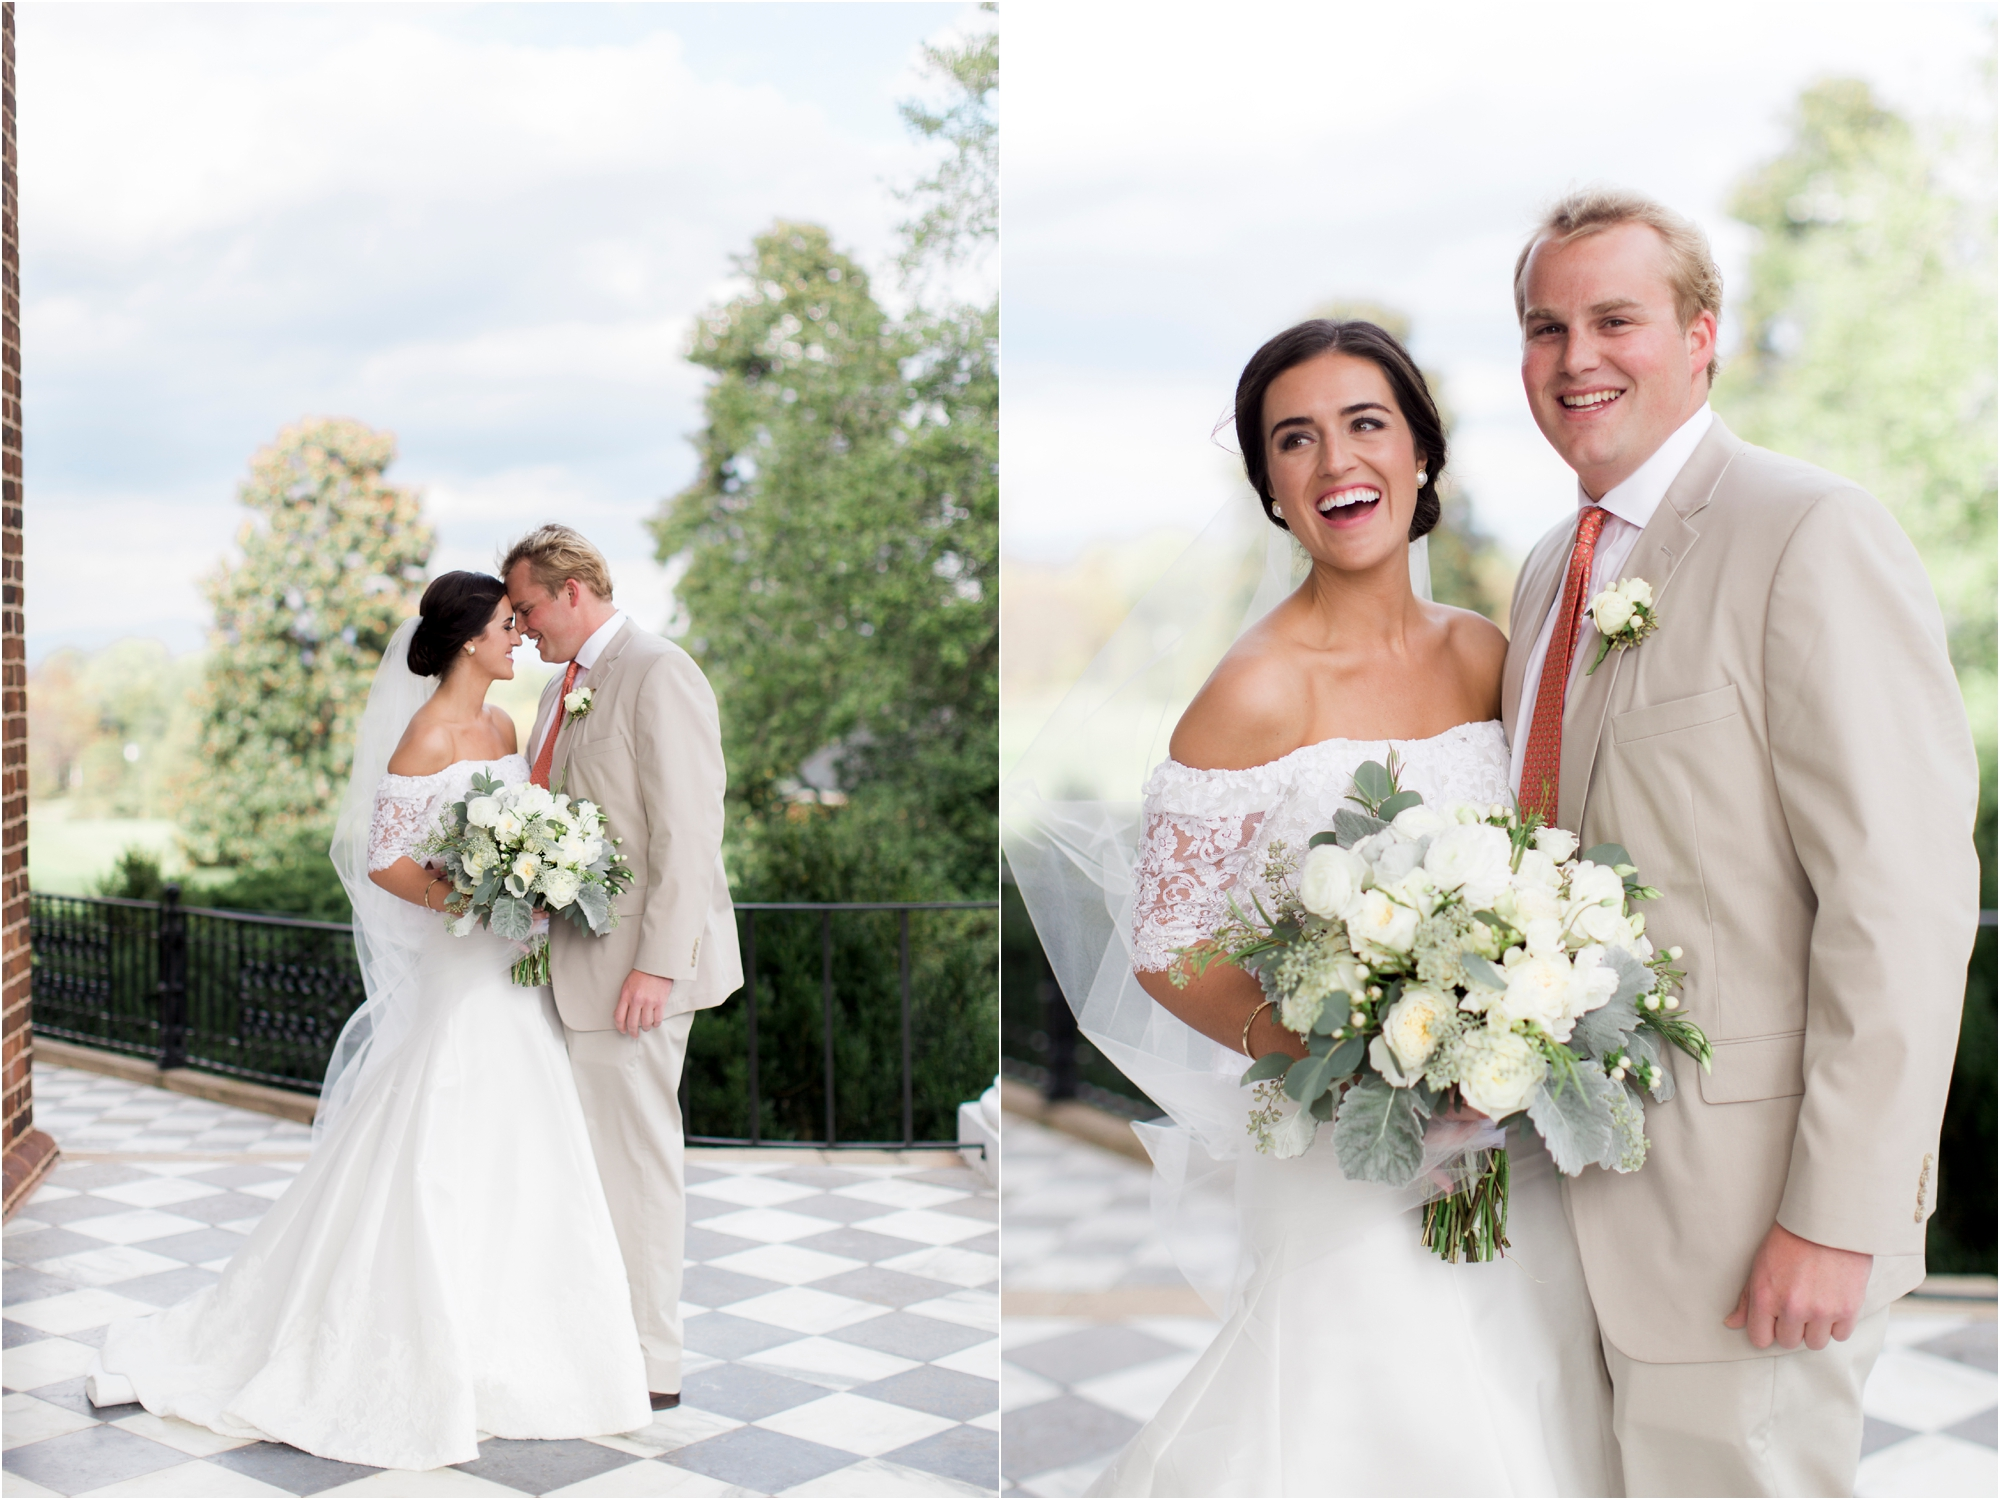 claire-thomas-farmington-country-club-charlottesville-virginia-wedding-photos_0013.jpg